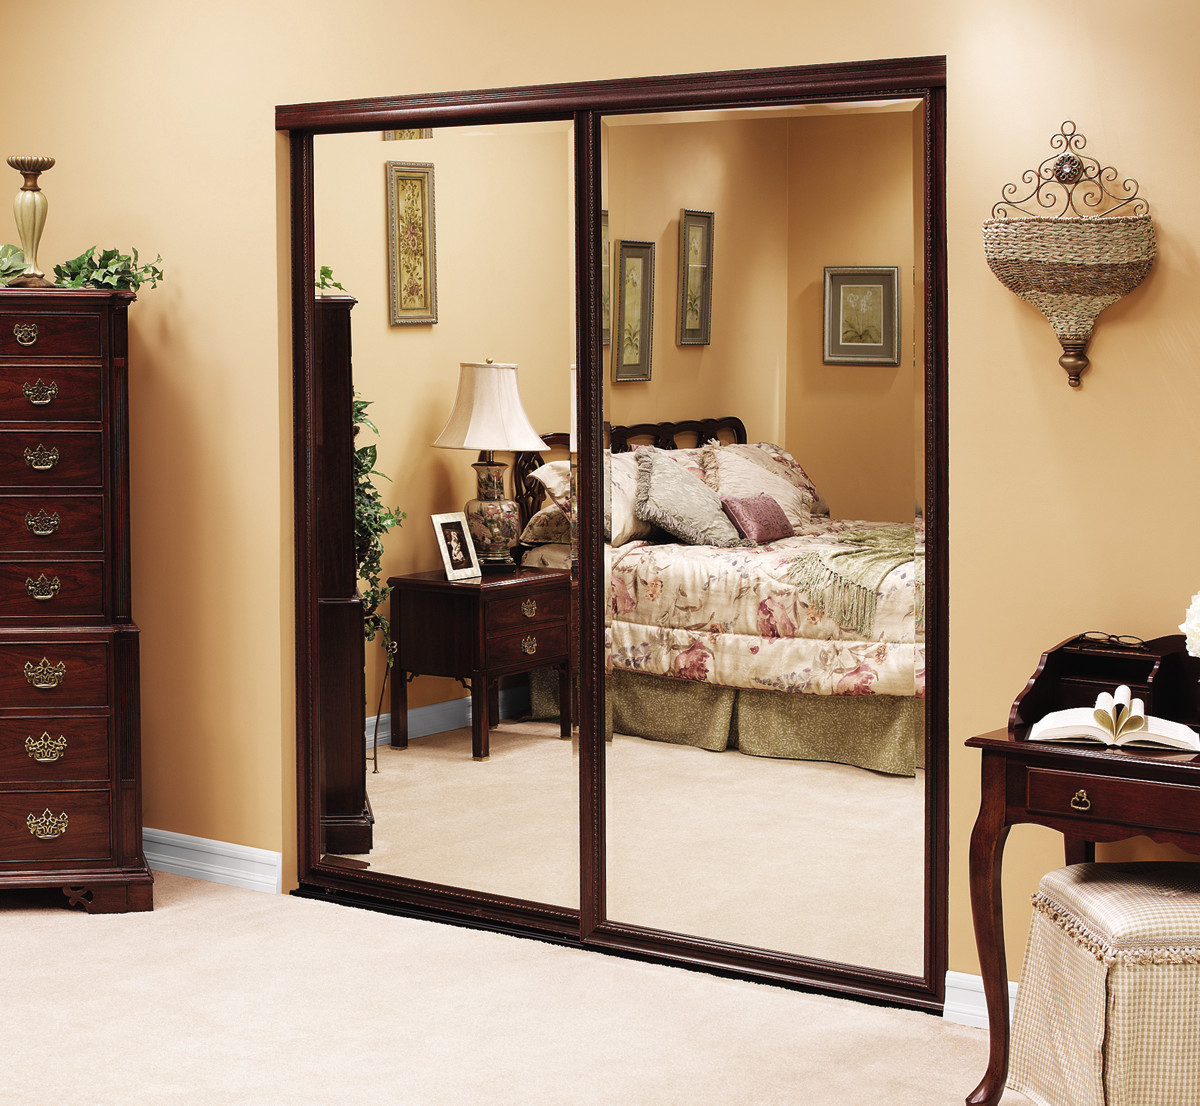 mirrored-wardrobe-1.jpg